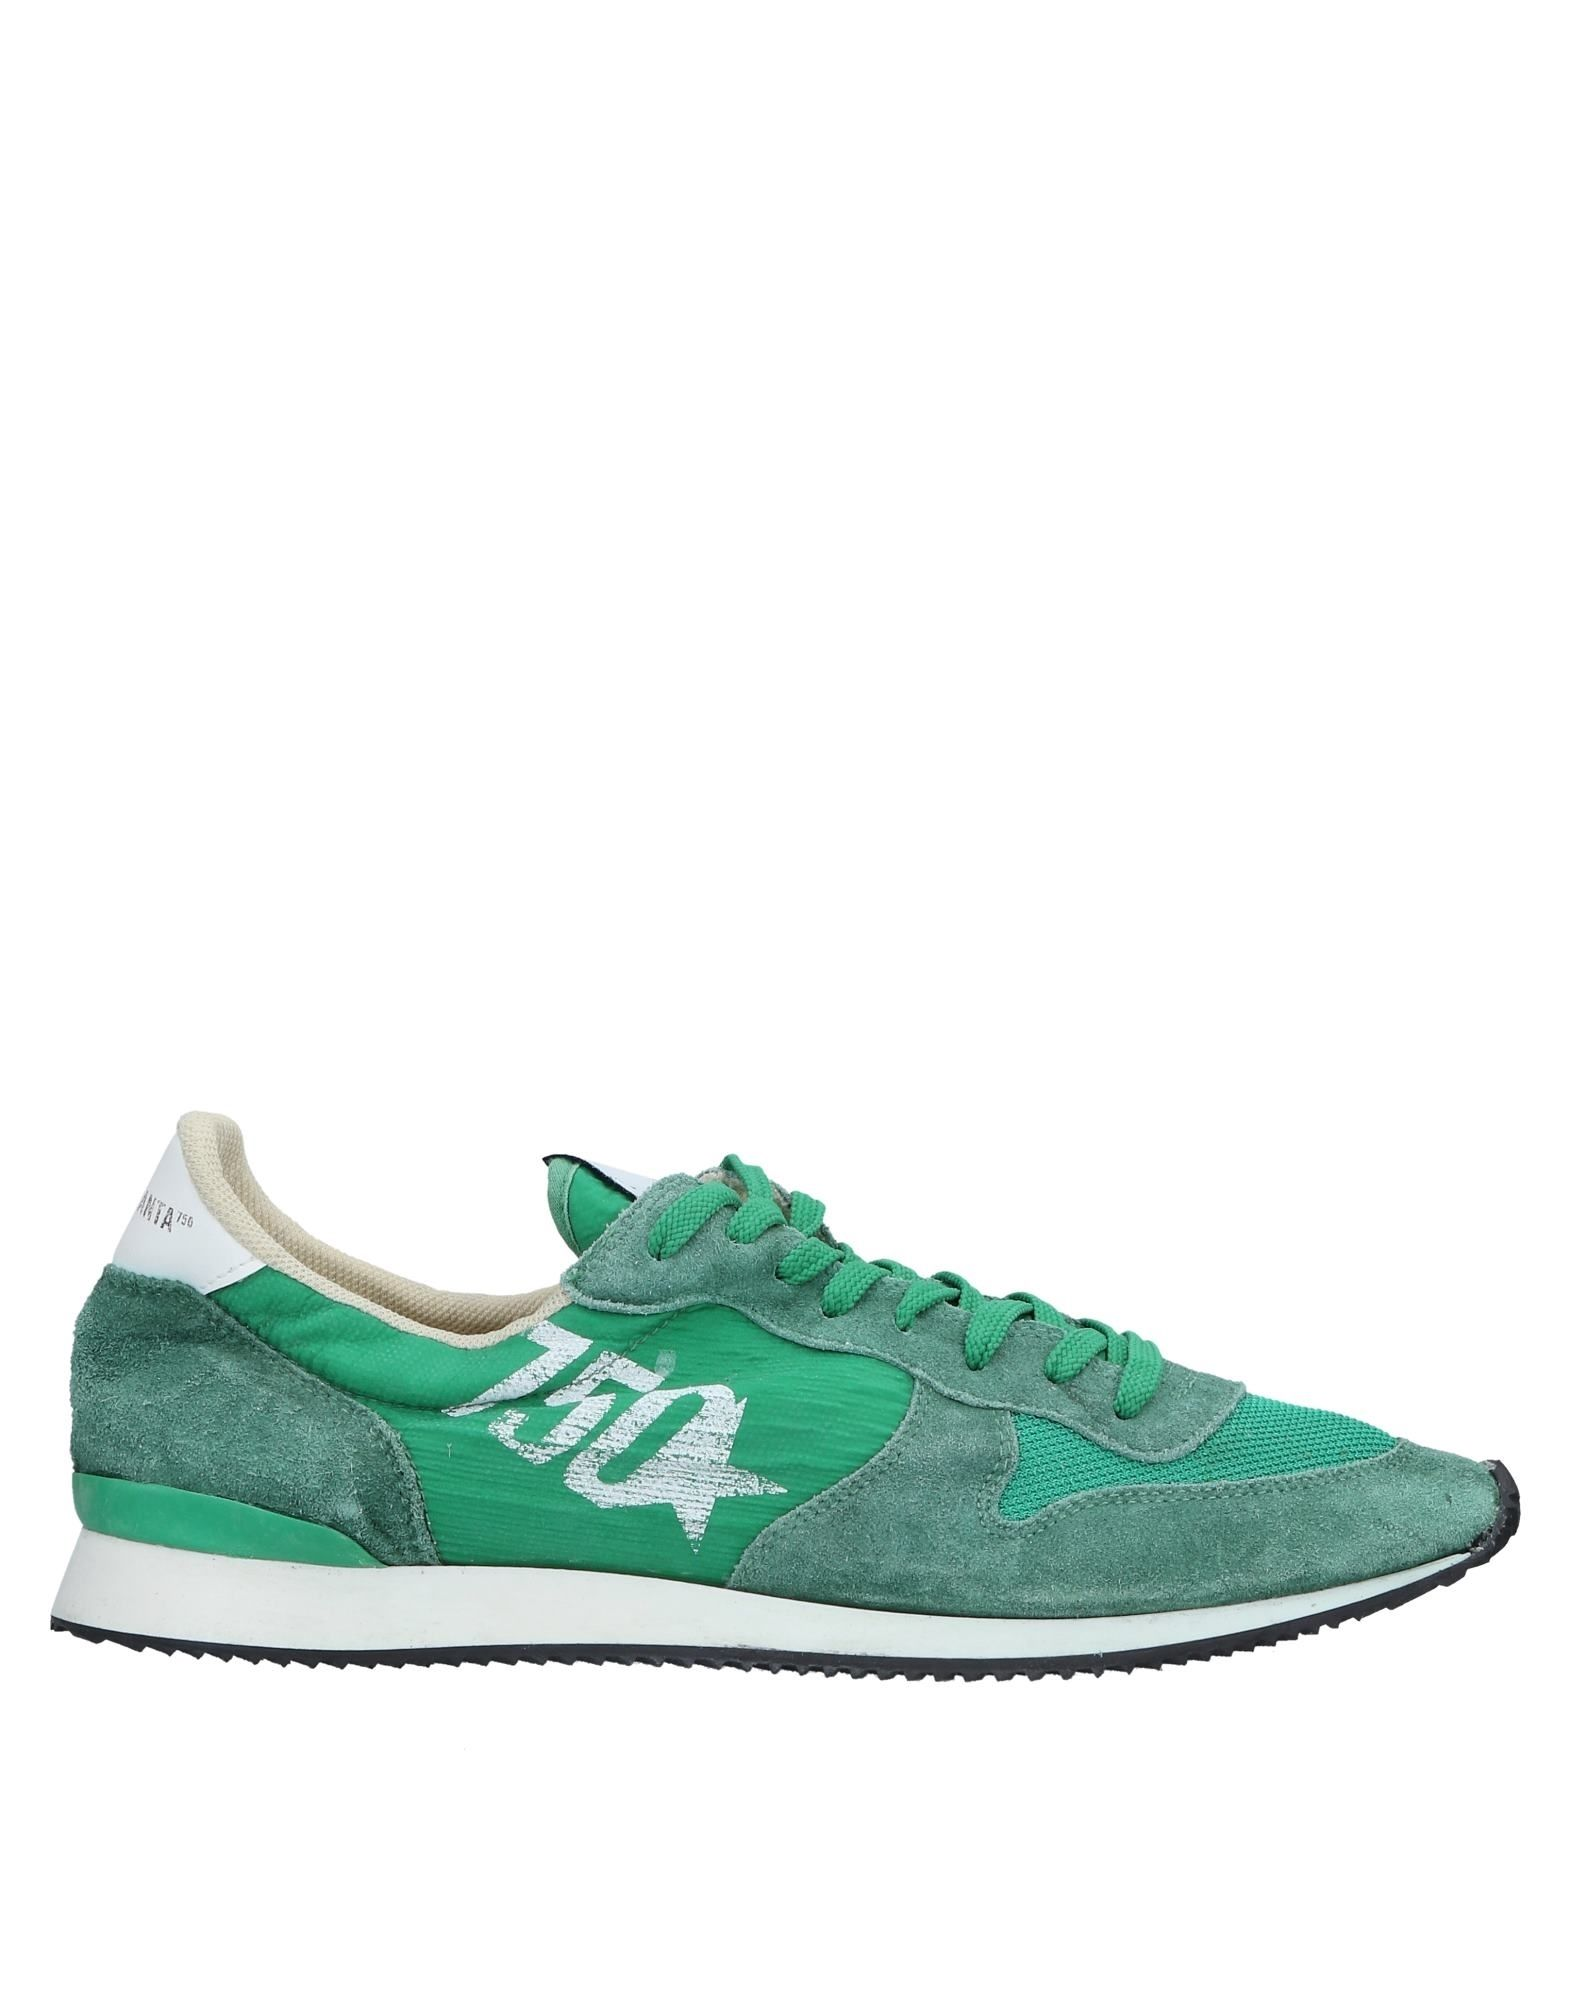 Moda Sneakers G750g Uomo - 11534972JQ